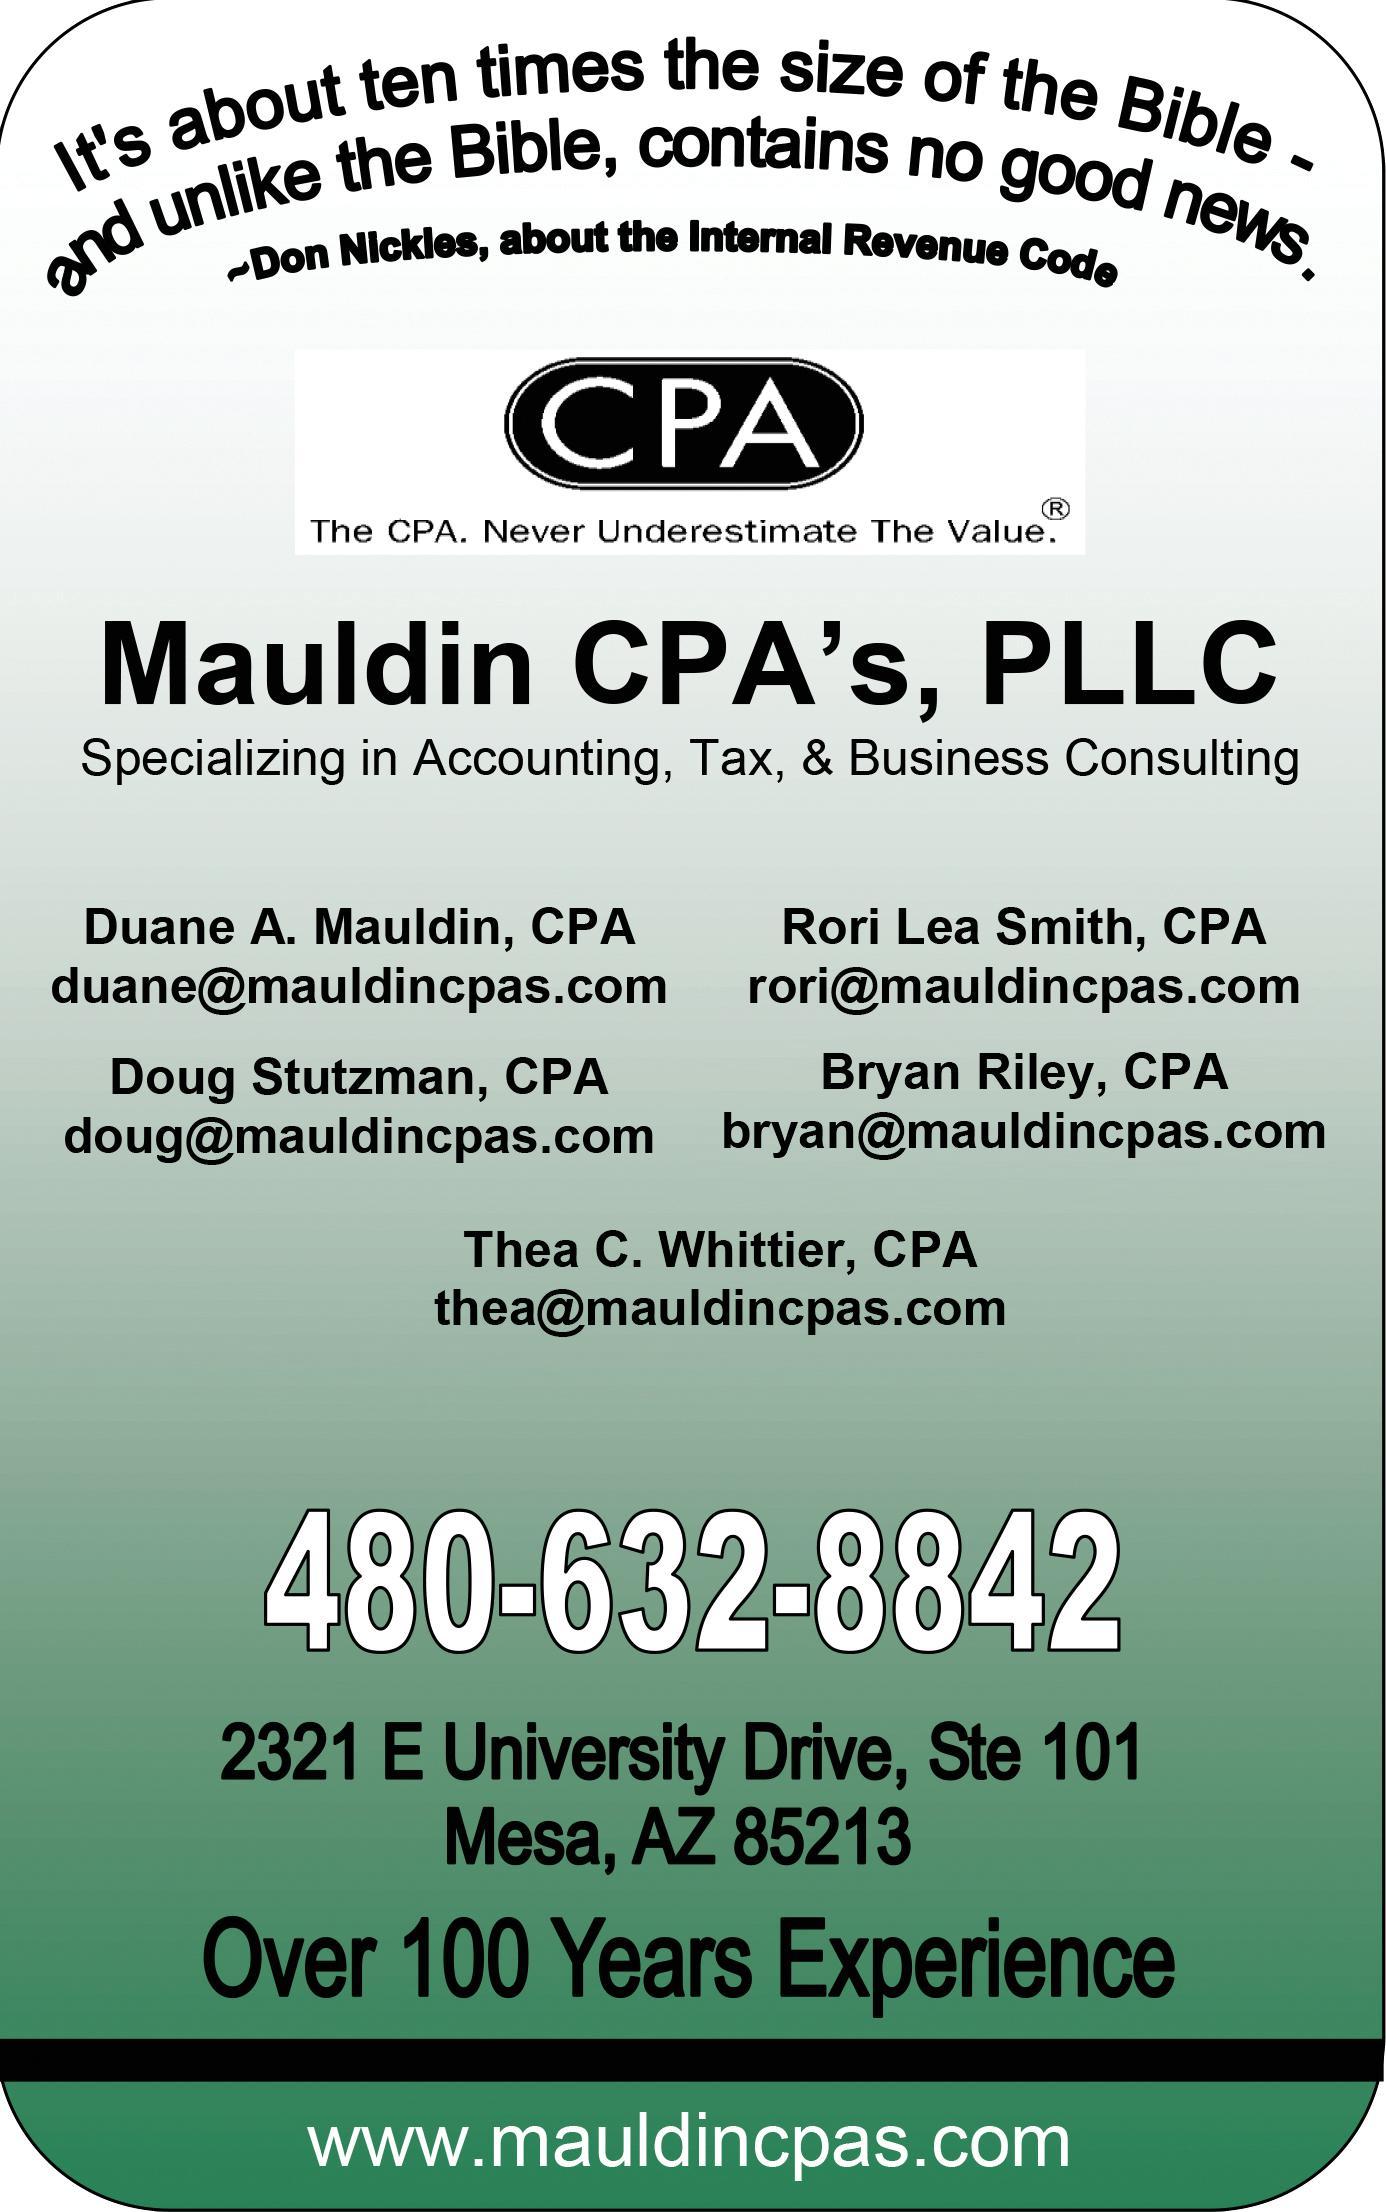 Mauldin CPA's, PLLC